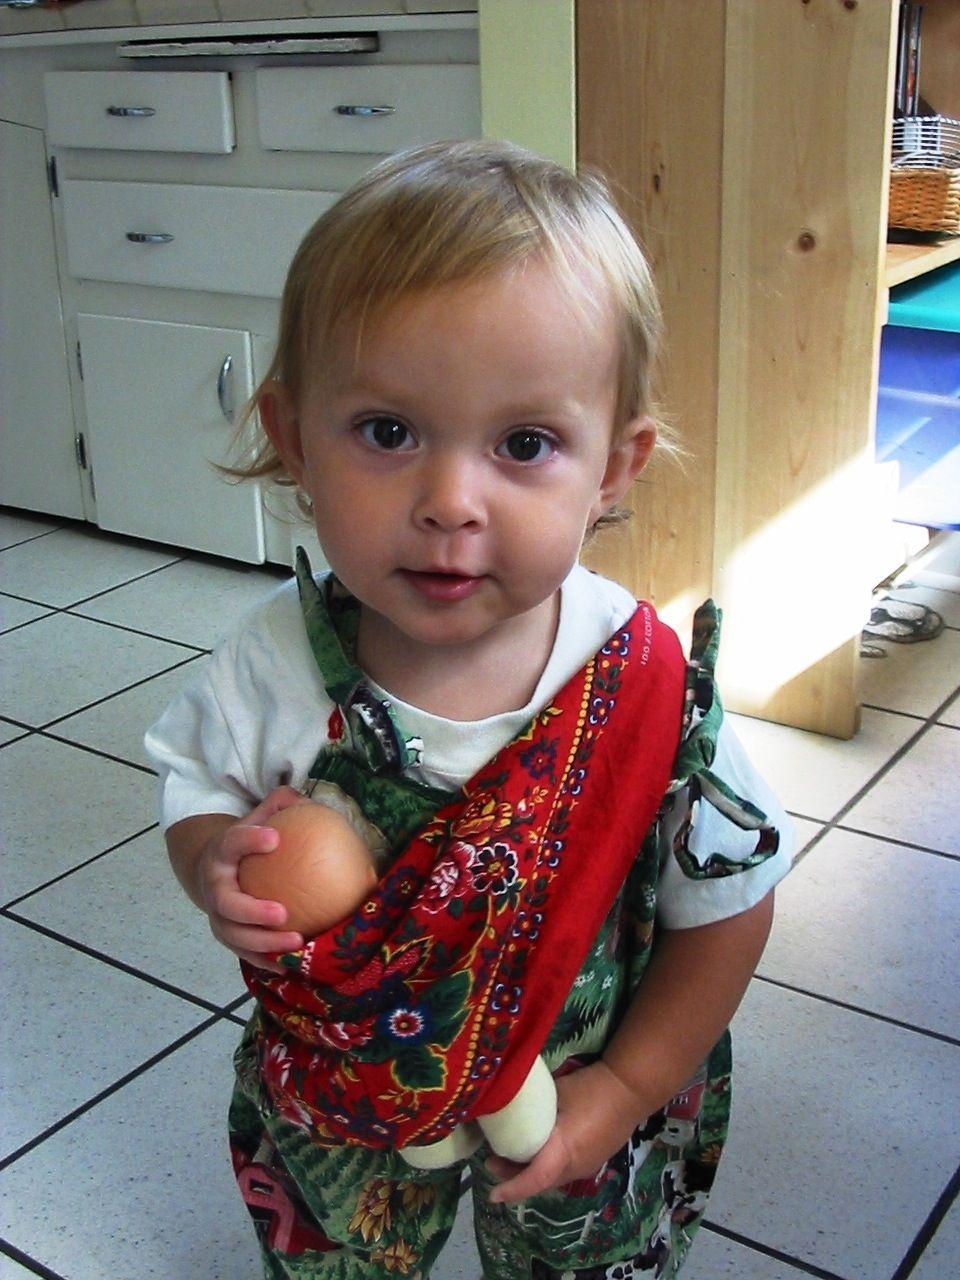 Baby wearing baby dolls